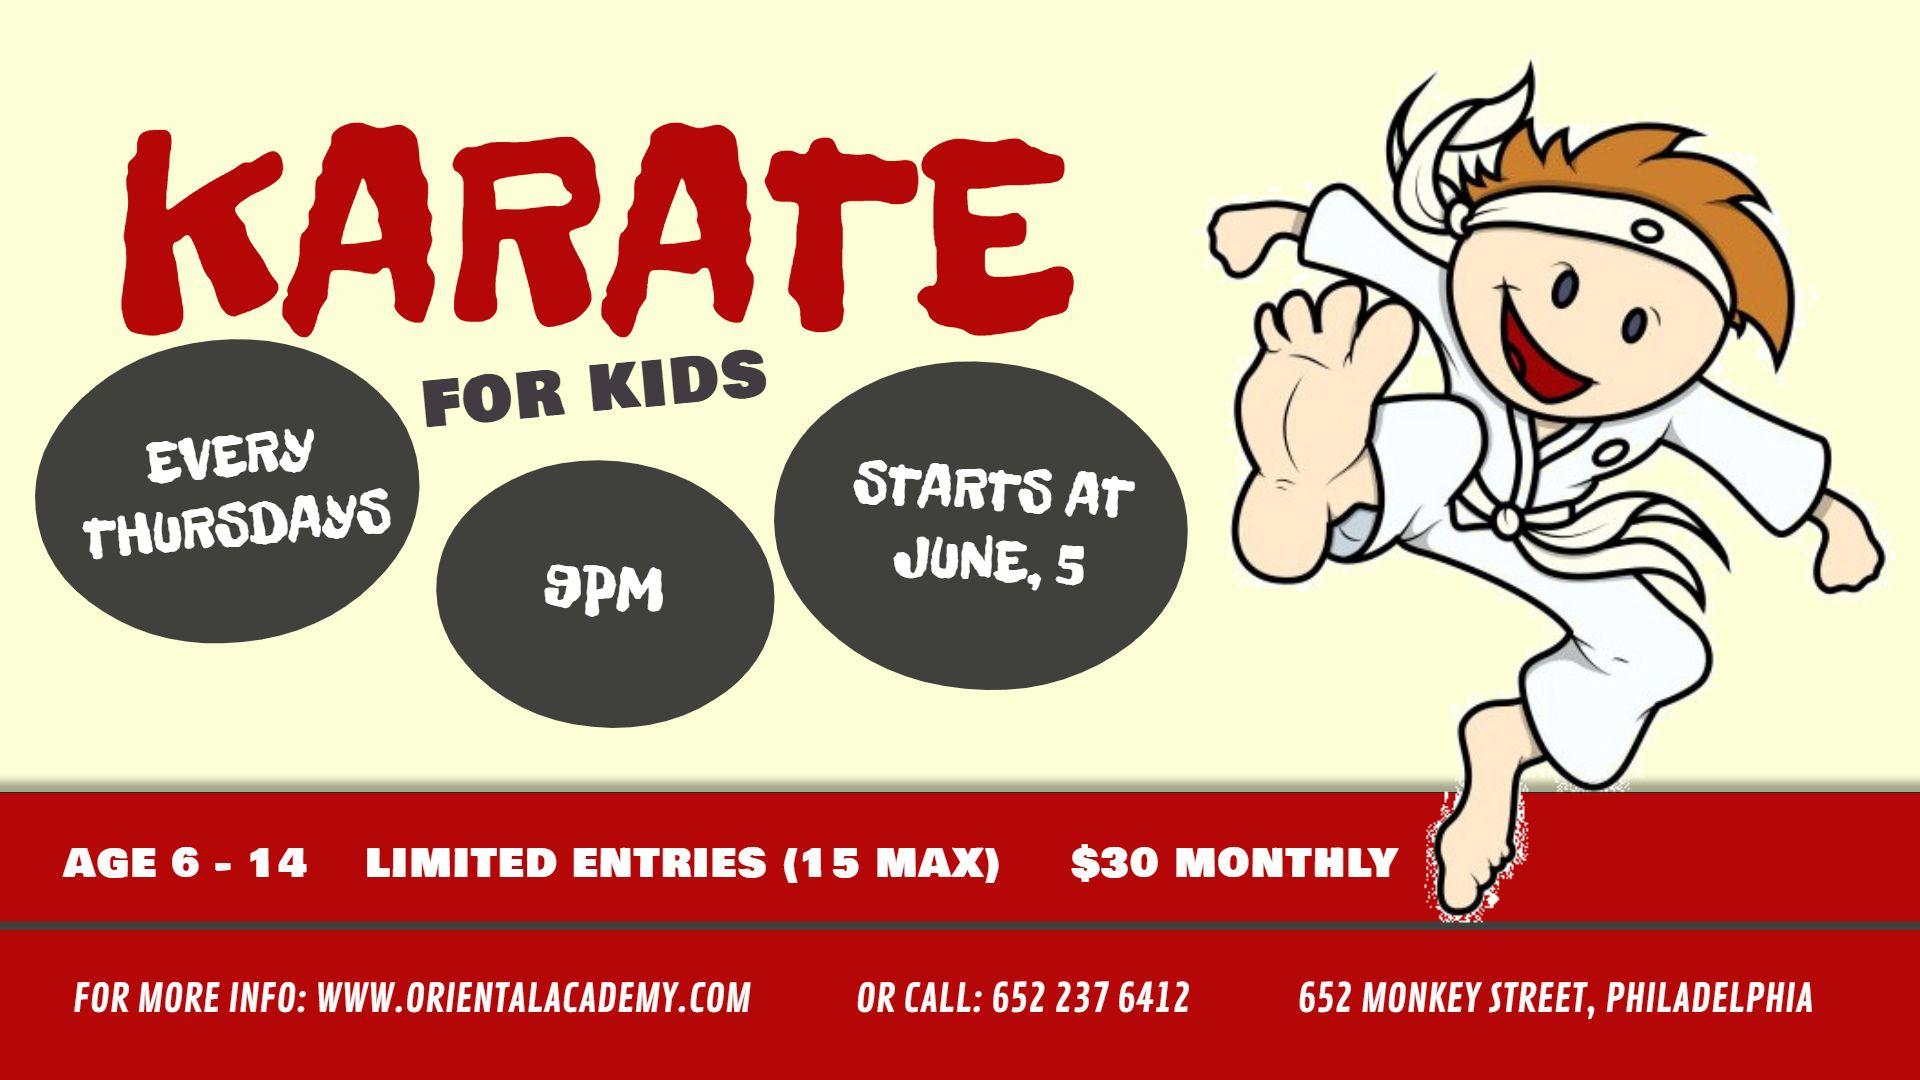 Karate school for kids class custom banner and digital